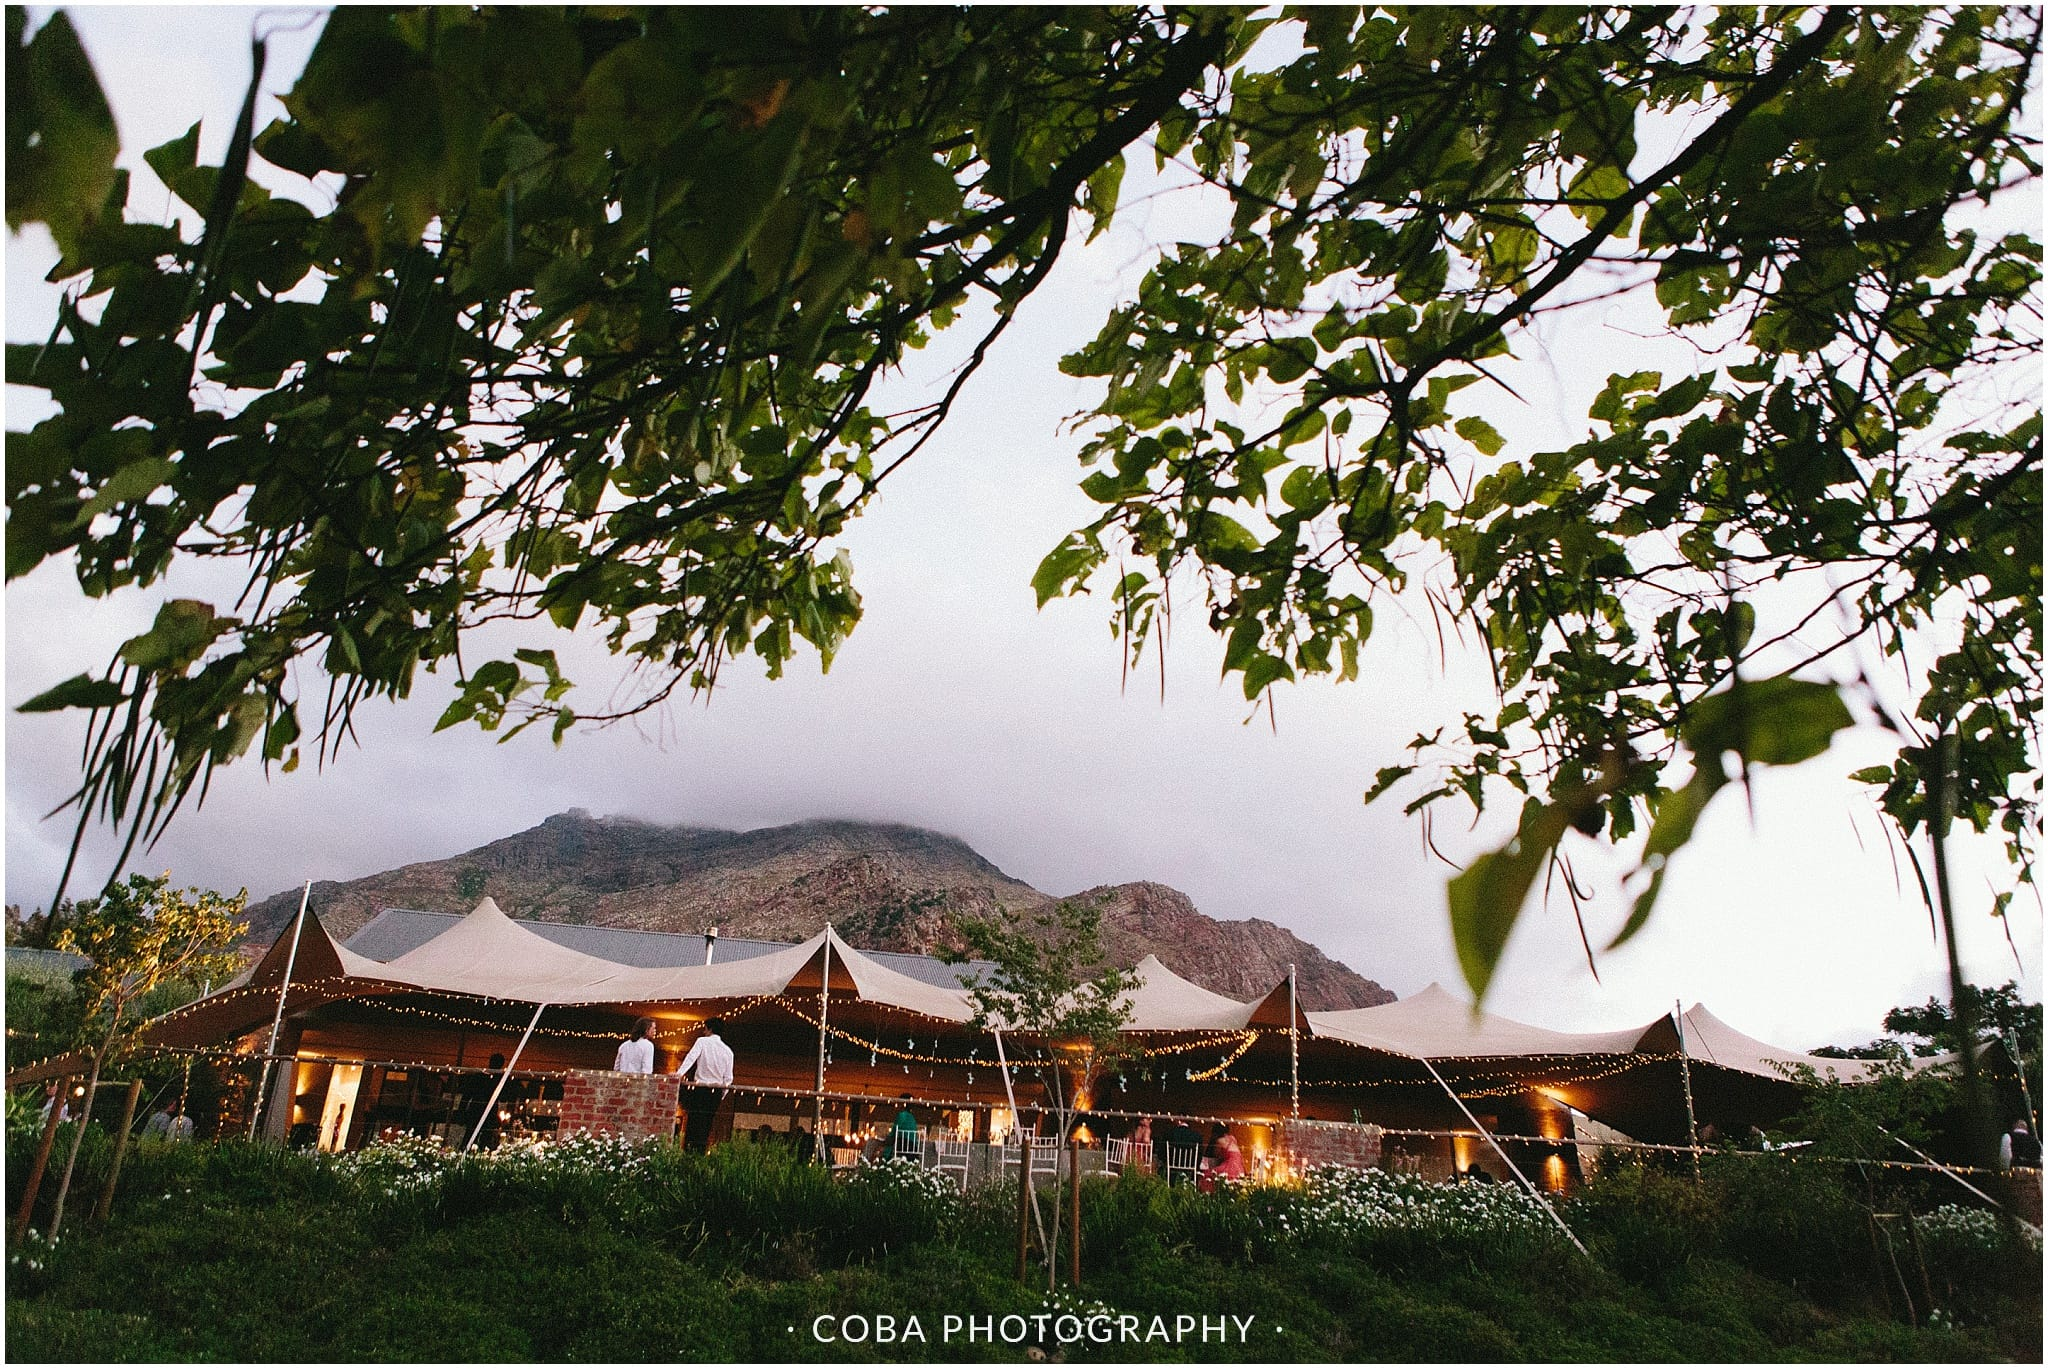 John&Pad - Olive Rock - Coba Photography (156)